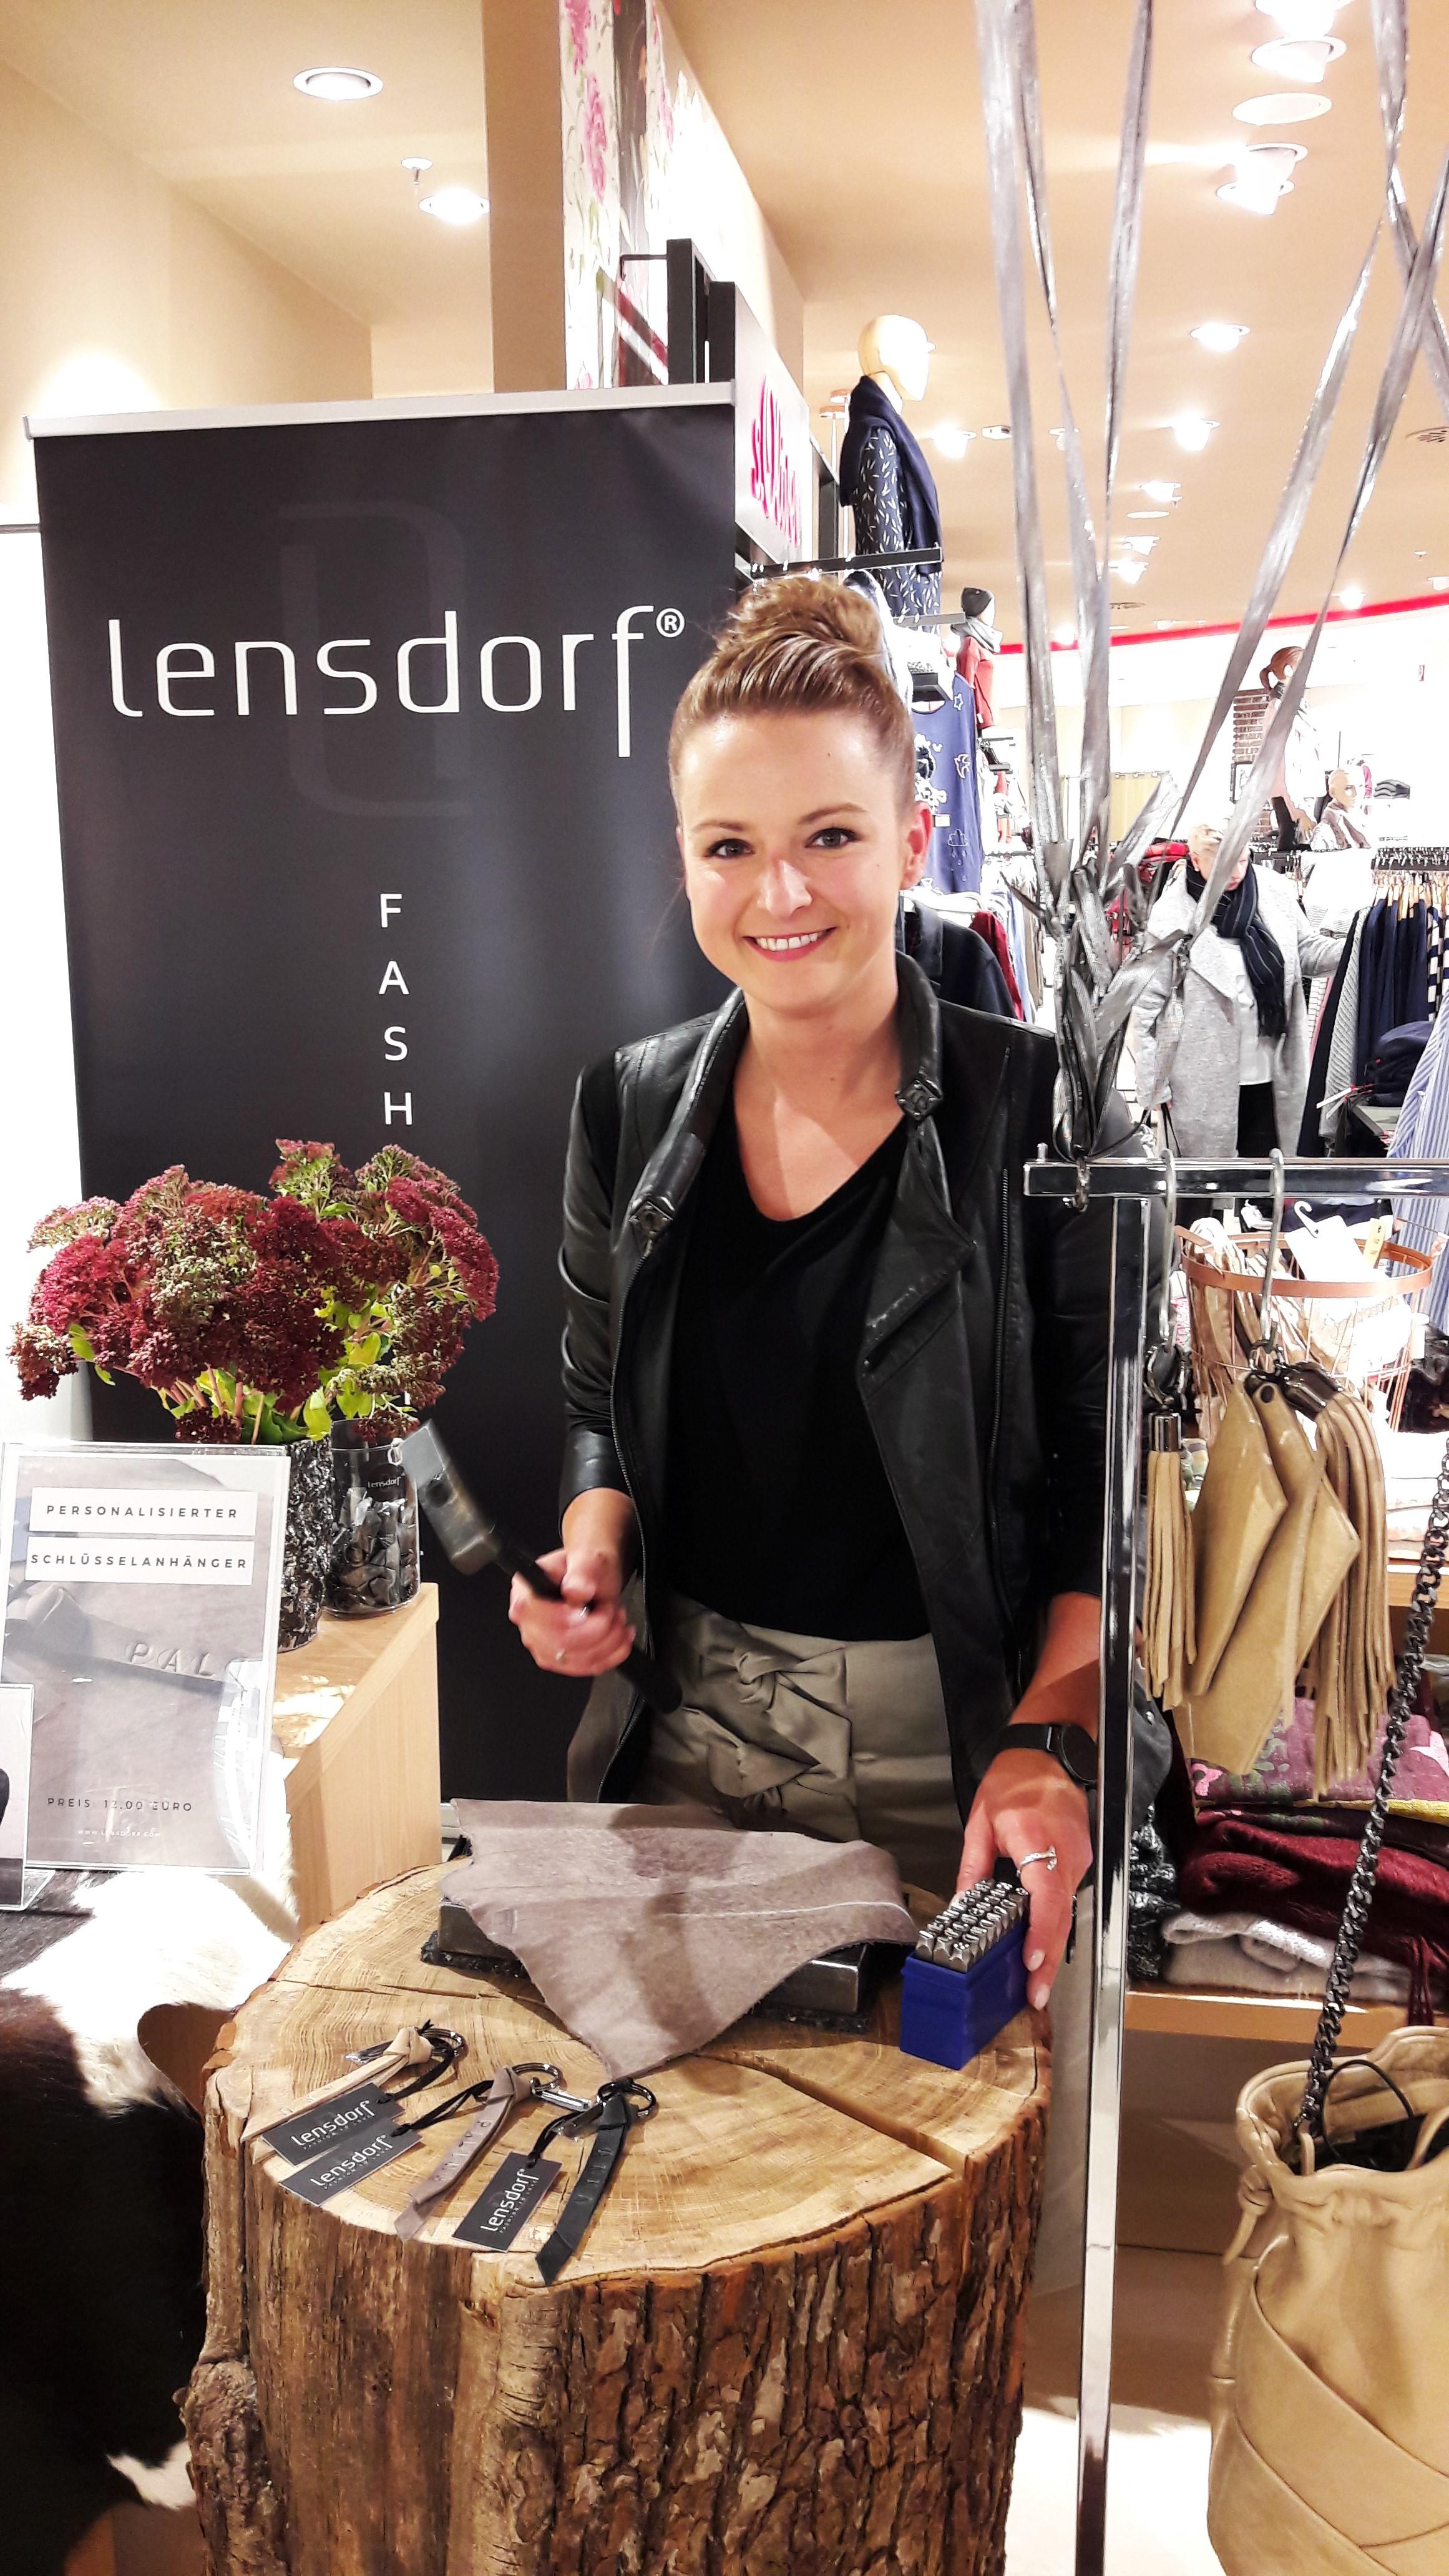 Adriana Schrader-Lensdorf